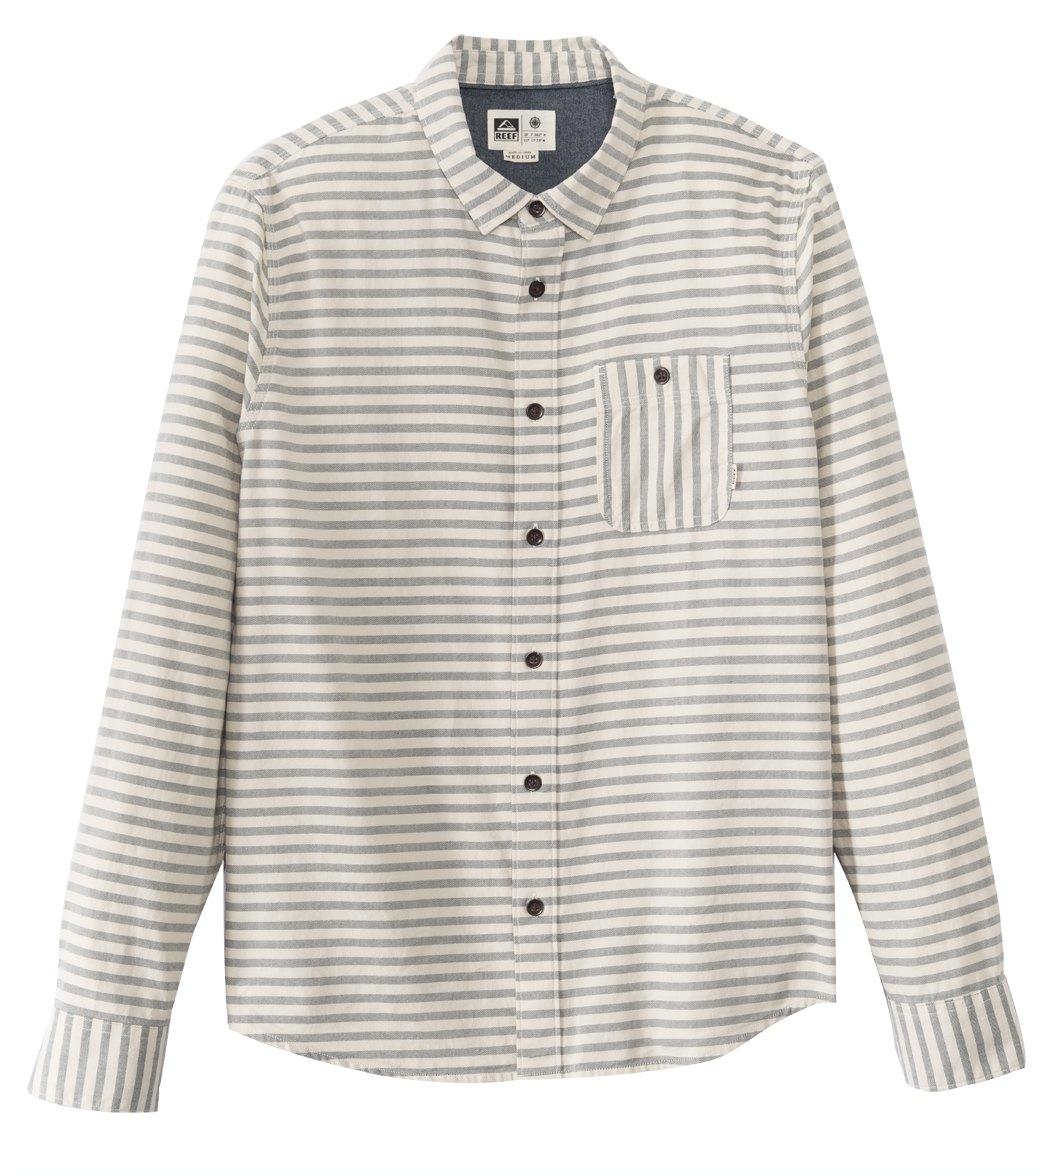 Reef Men's Gainsberg L/S Shirt - Natural Small Cotton - Swimoutlet.com